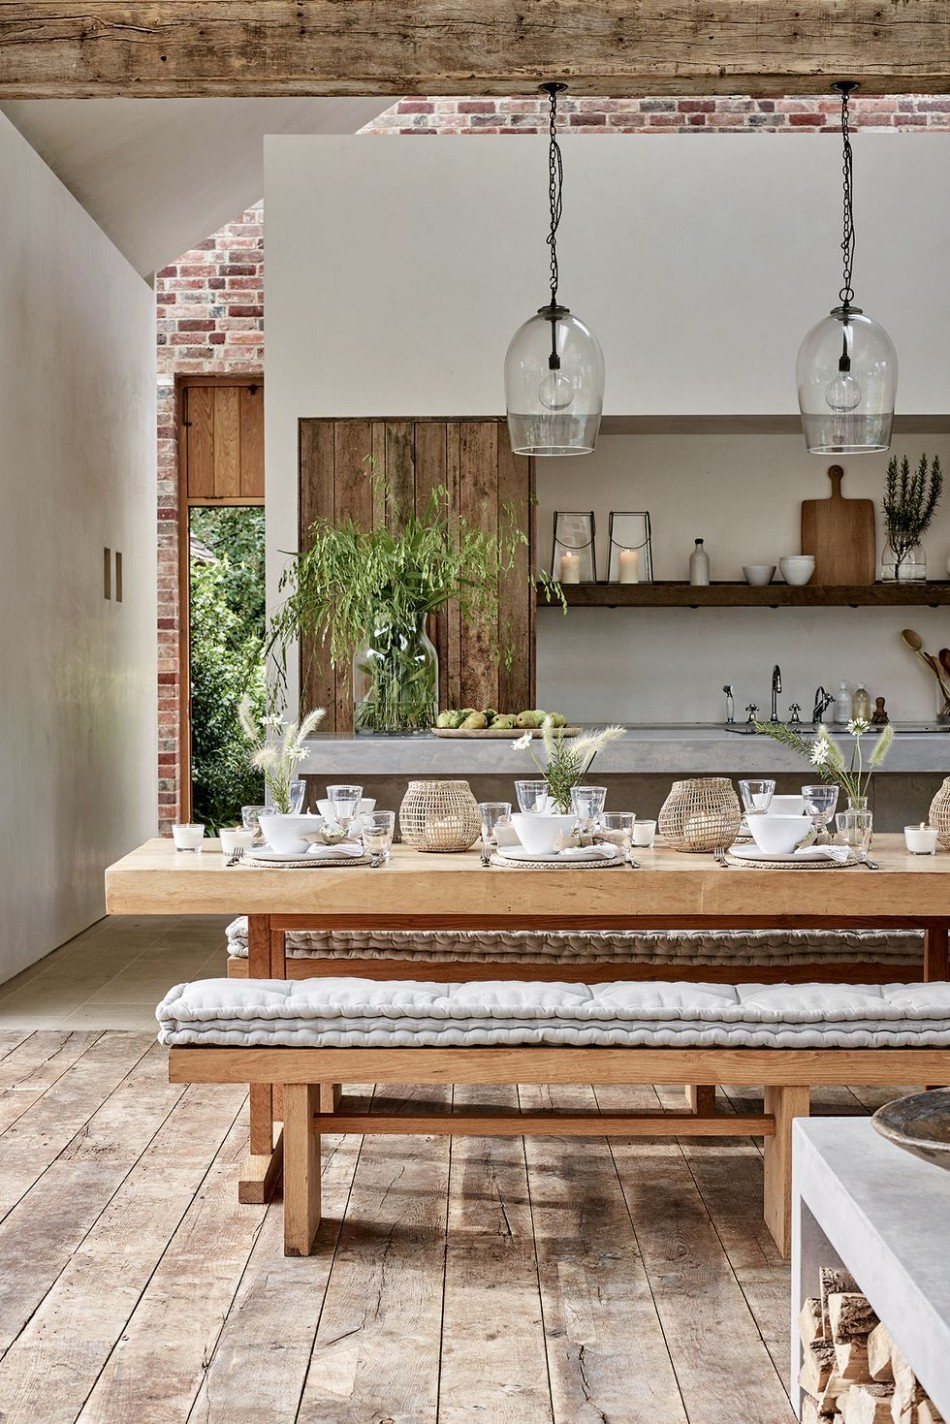 10+ Rustic Decor Ideas - Modern Rustic Style Rooms - Rustic Apartment Decor Ideas